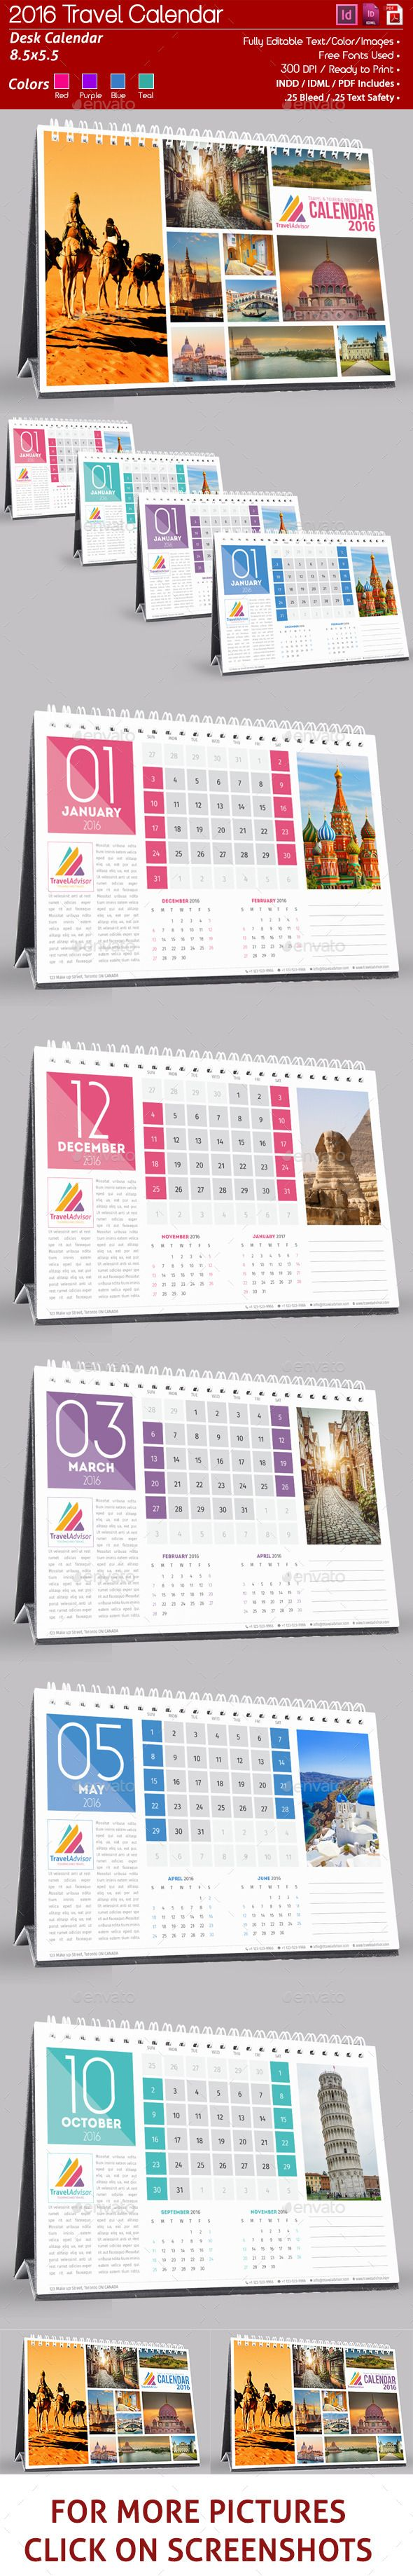 Corporate 12 Page 2016 Desk Calendar Template InDesign INDD #design Download: http://graphicriver.net/item/corporate-12-page-2016-desk-calendar/14068233?ref=ksioks